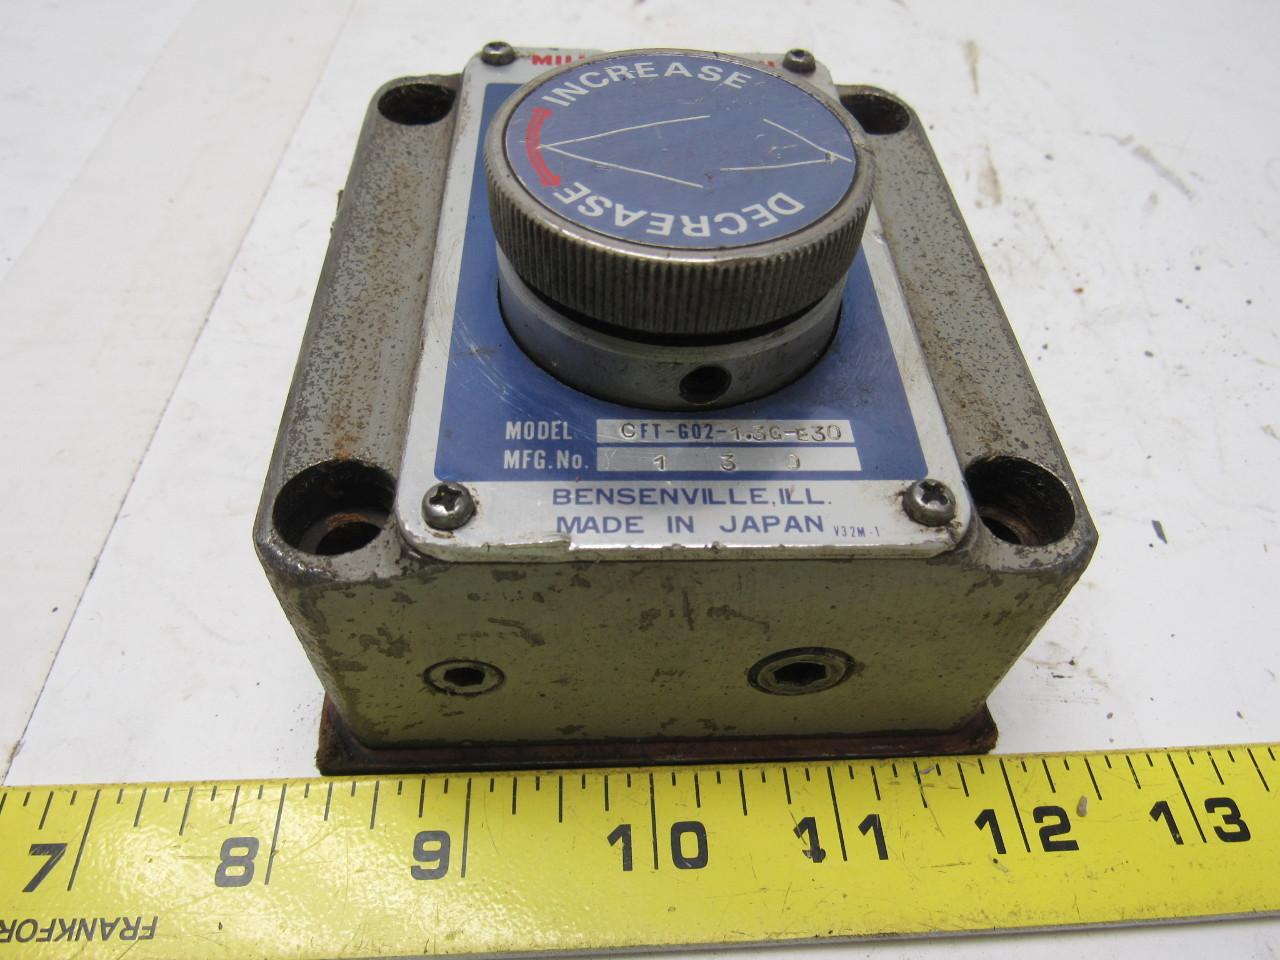 Miller Nachi CFT-G02-1.3G-E30 Hydraulic Flow Control Valve